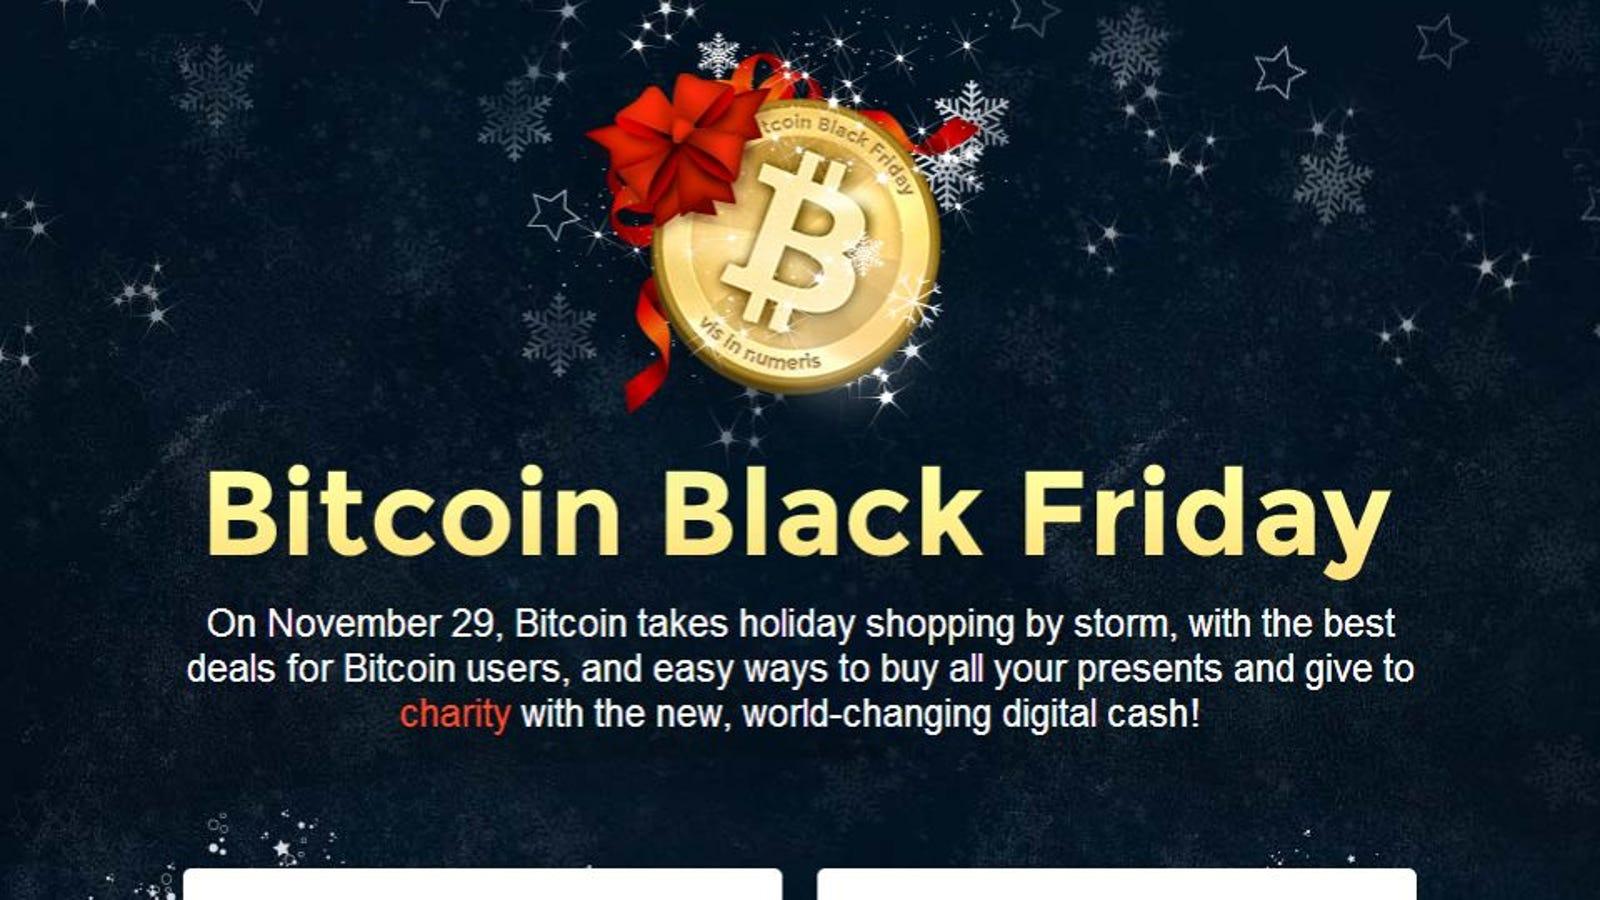 Bitcoin black friday during